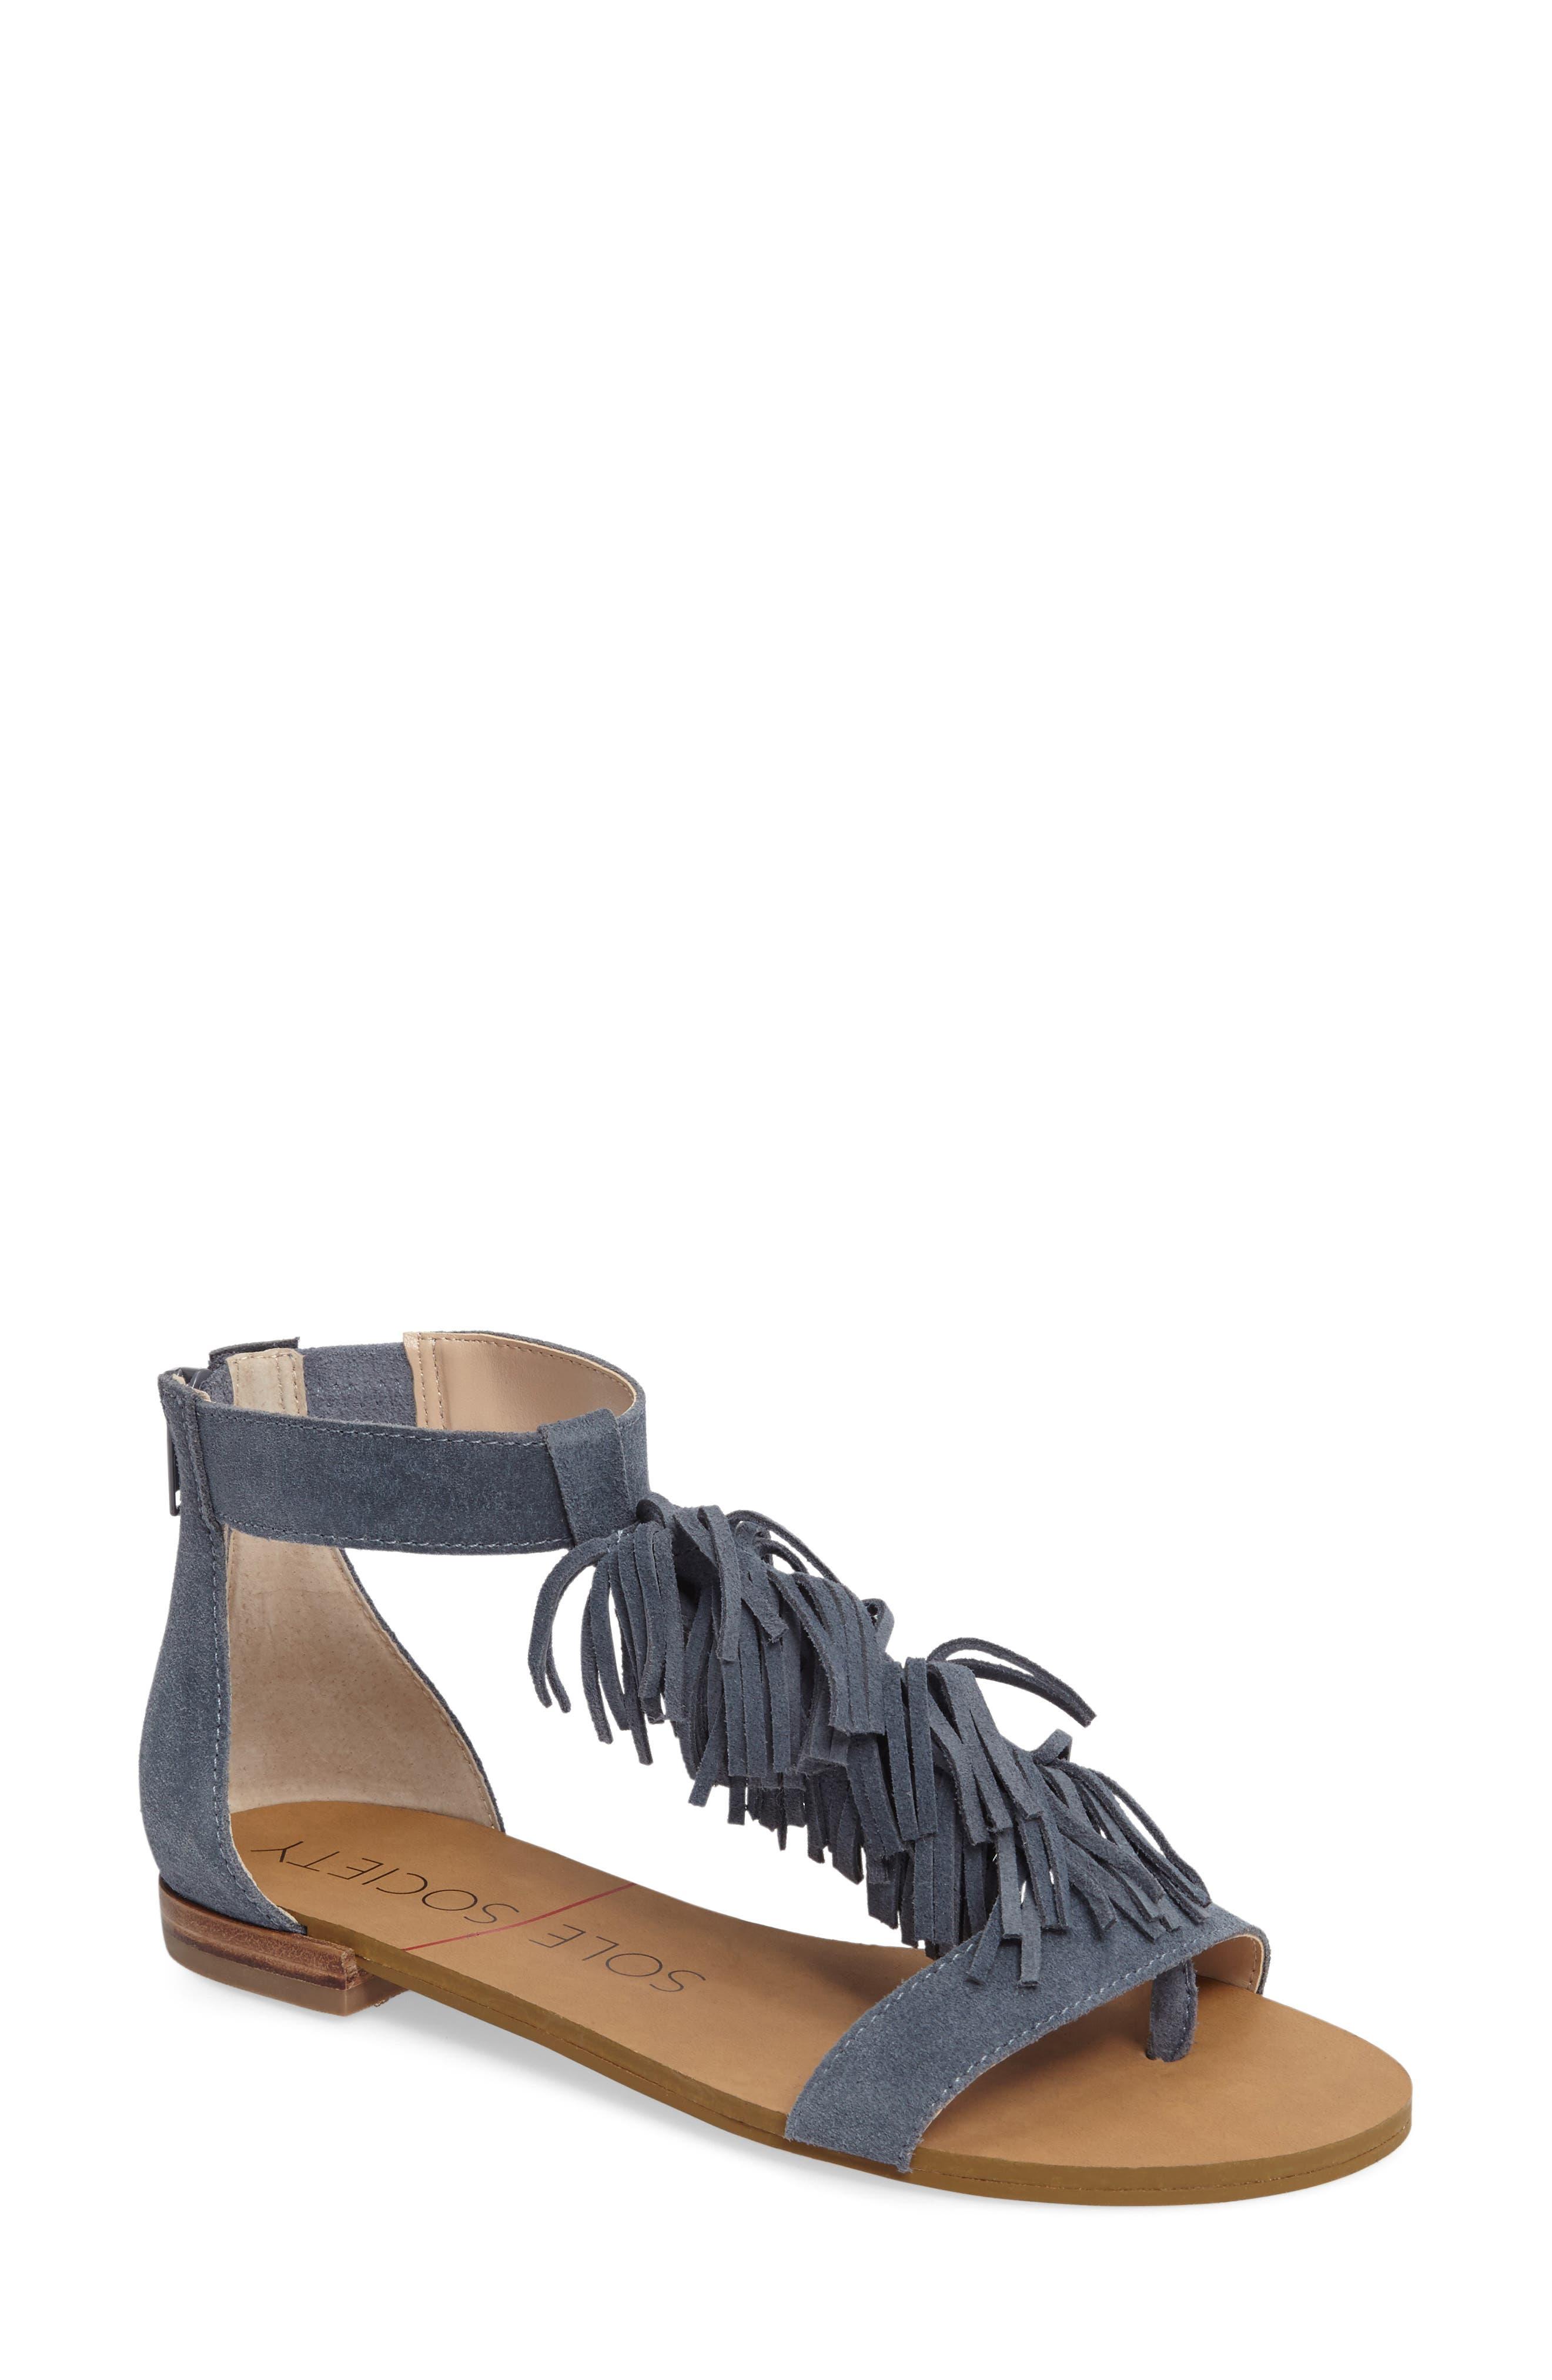 Alternate Image 1 Selected - Sole Society Koa Fringed T-Strap Sandal (Women)